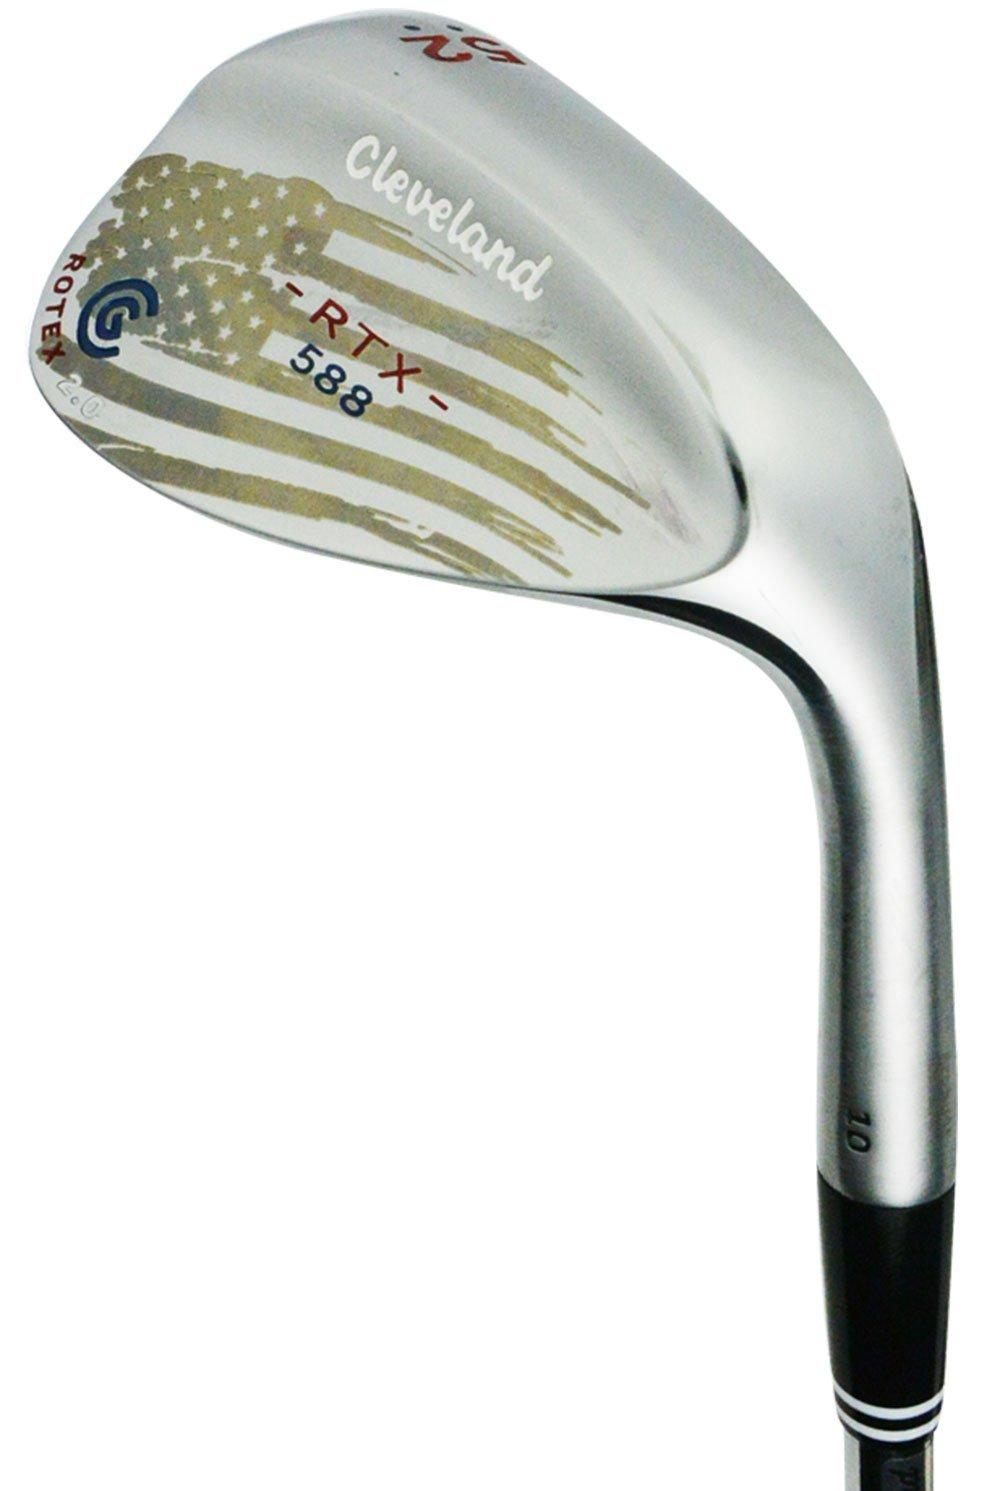 Cleveland Golf 588 RTX 2.0 Custom Edition Wedge